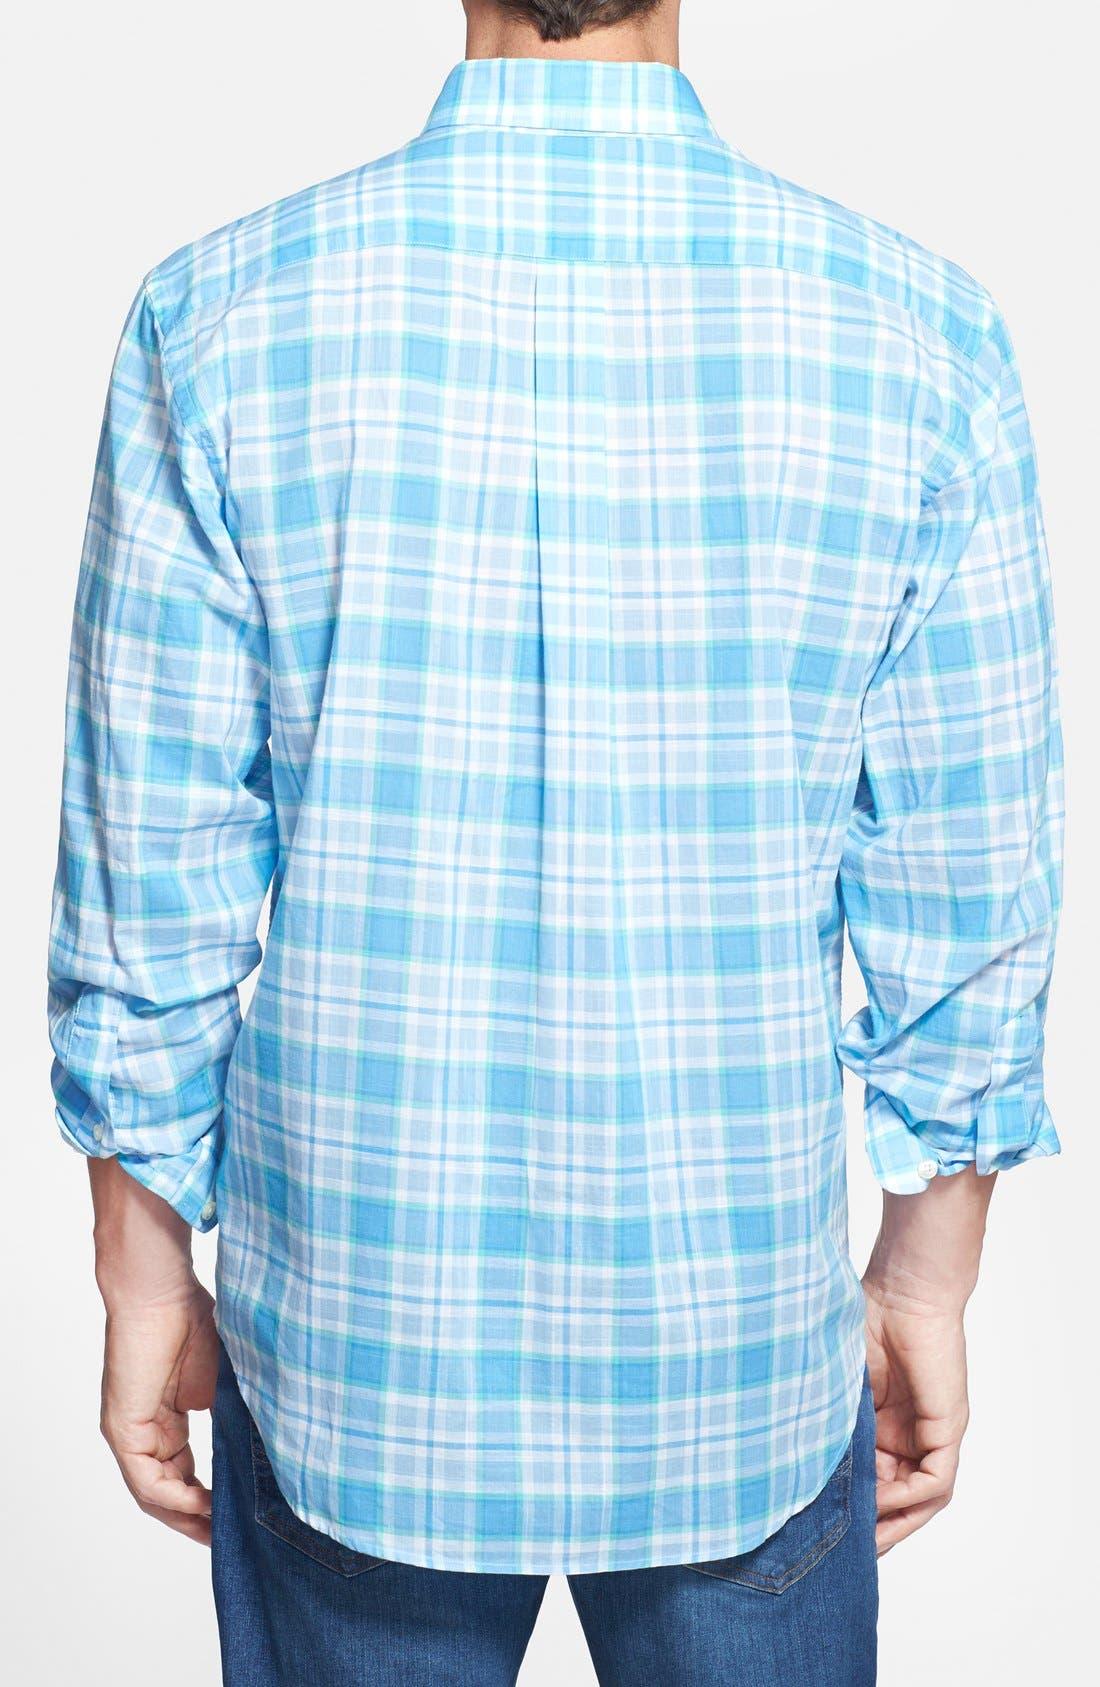 Alternate Image 2  - Vineyard Vines 'Tucker' Classic Fit Plaid Sport Shirt